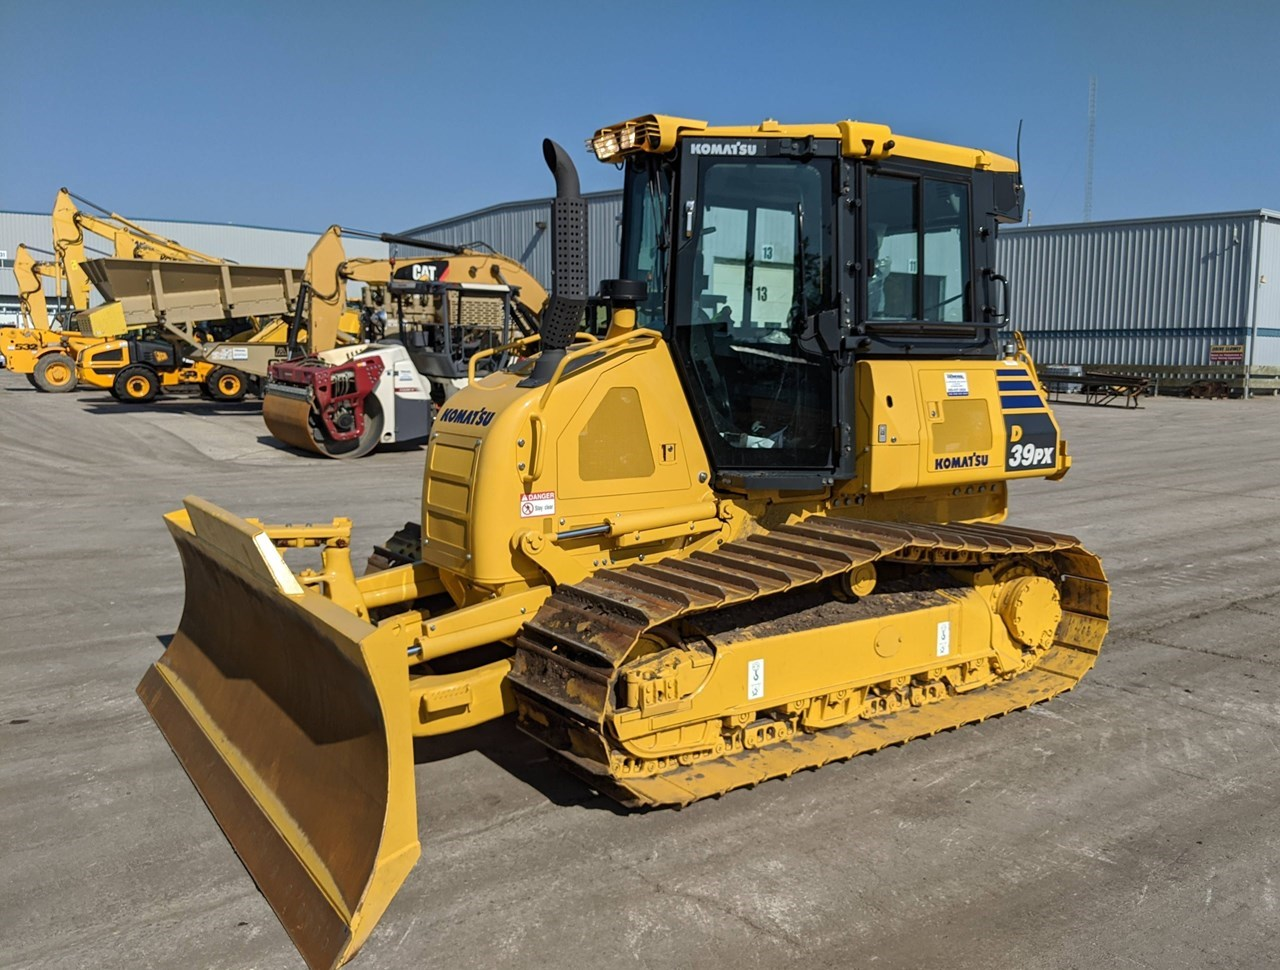 2018 Komatsu D39PX-24 Crawler Tractor For Sale